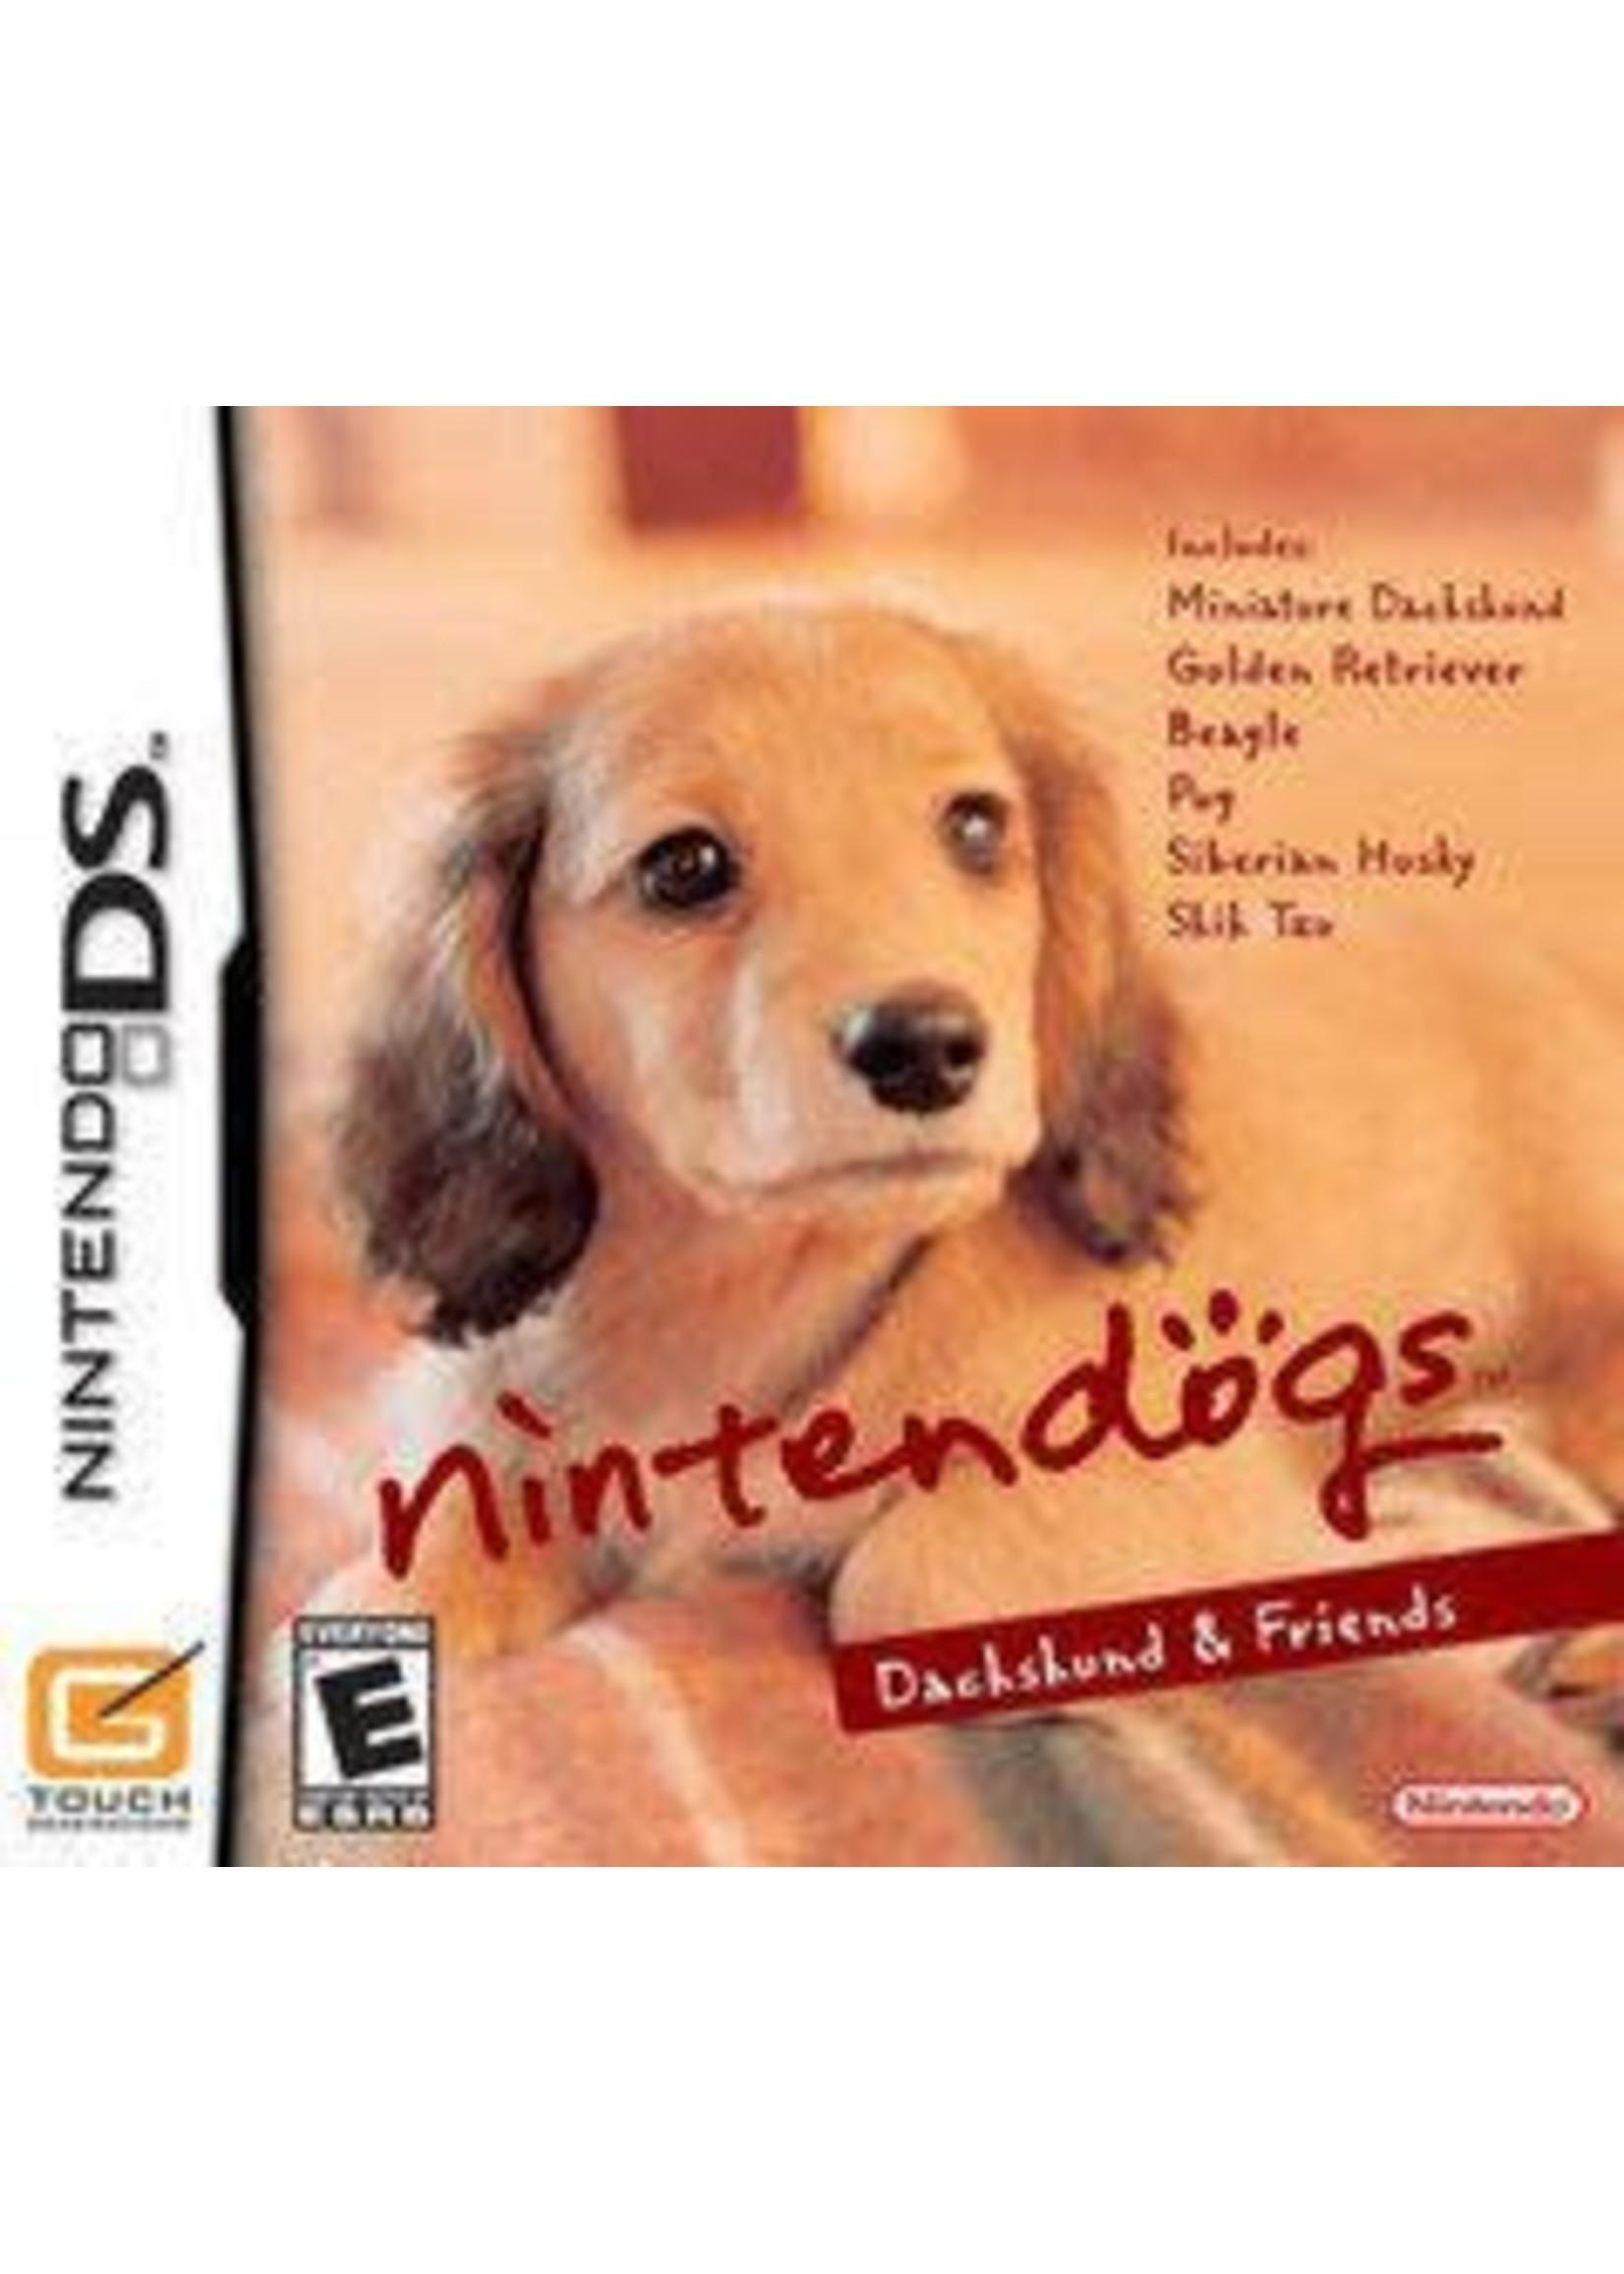 Nintendogs Dachshund And Friends Nintendo DS